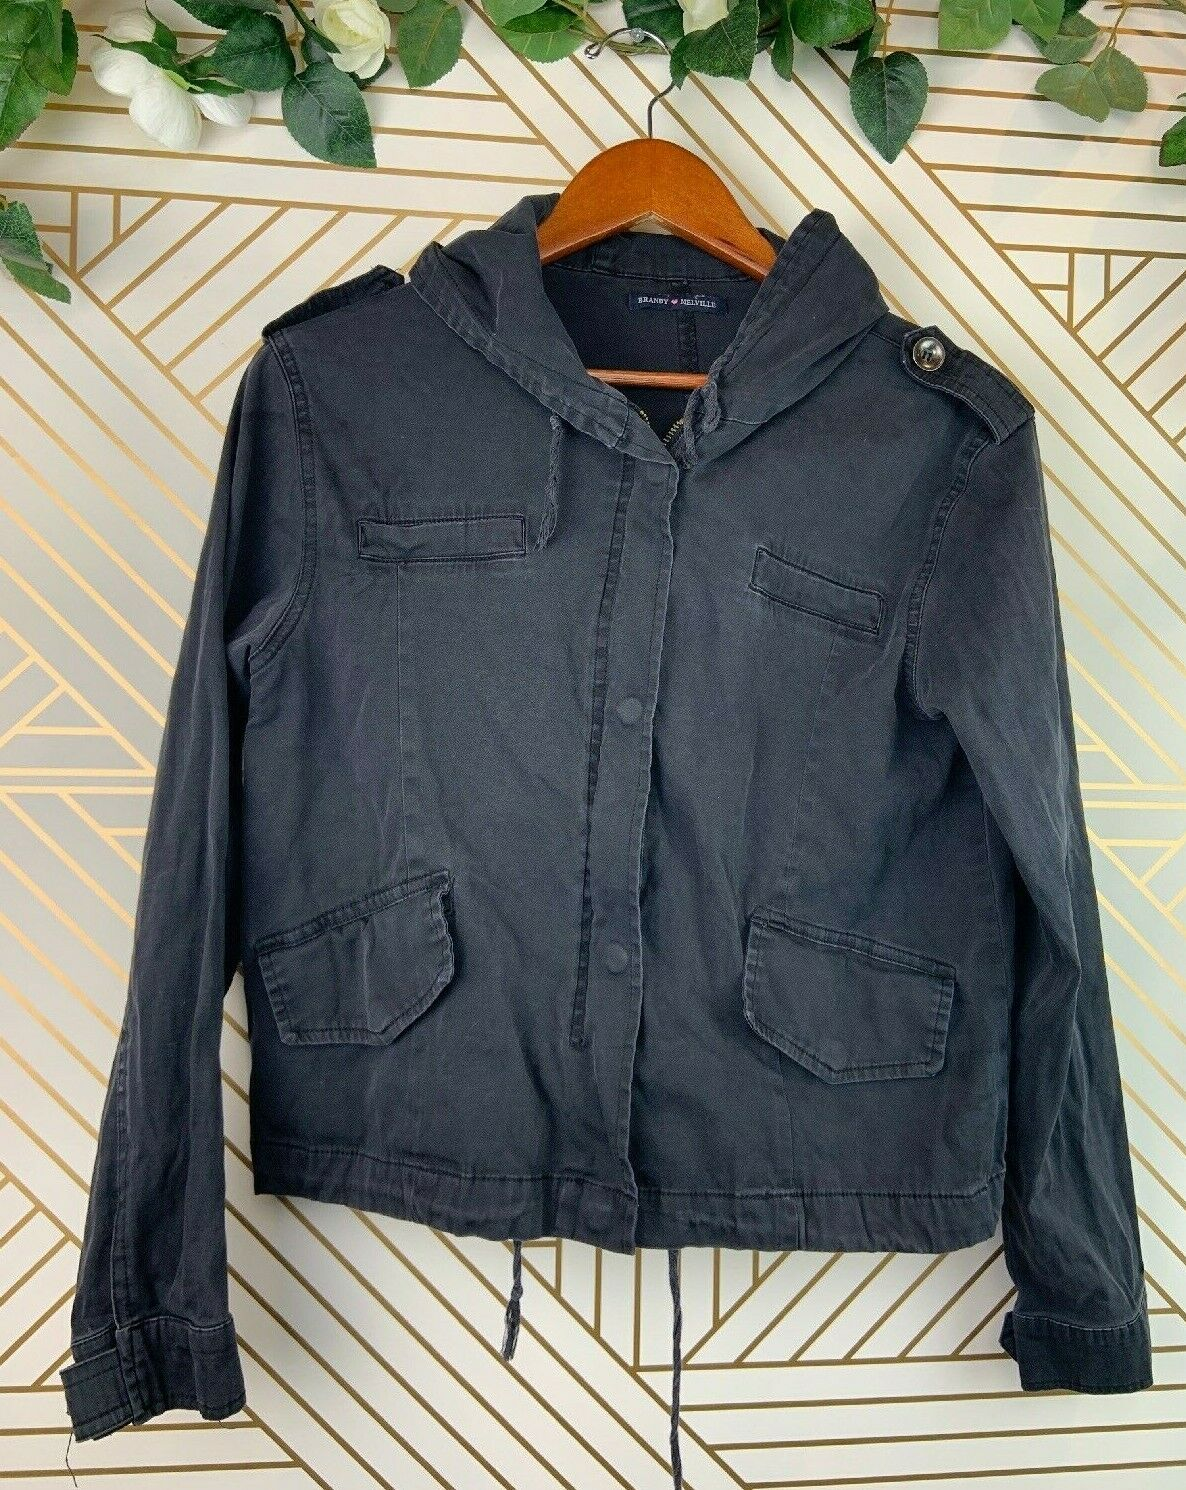 Brandy Melville Hailey Jacket Black Size XS-S Black